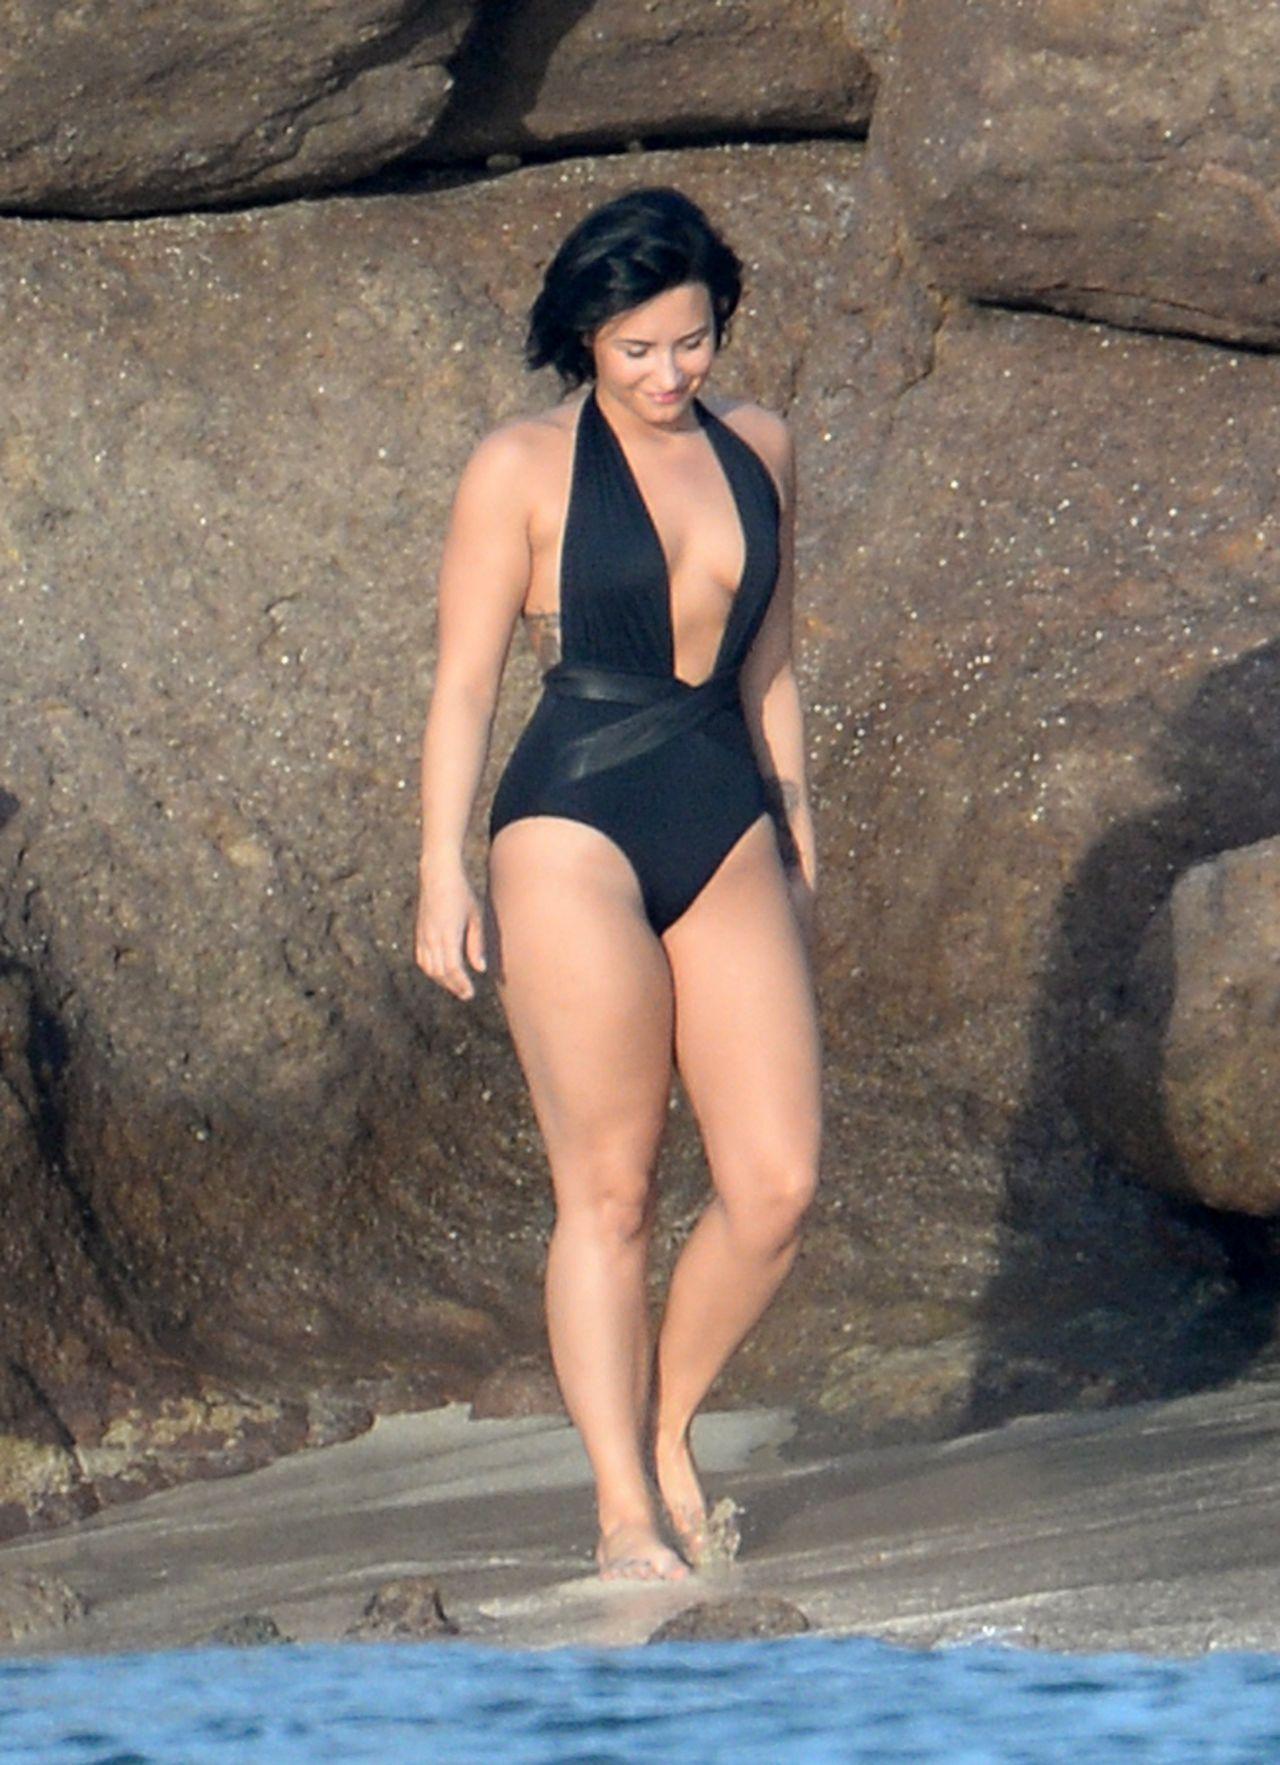 demi-lovato-wearing-a-swimsuit-in-st.-barts-12-17-2015_30